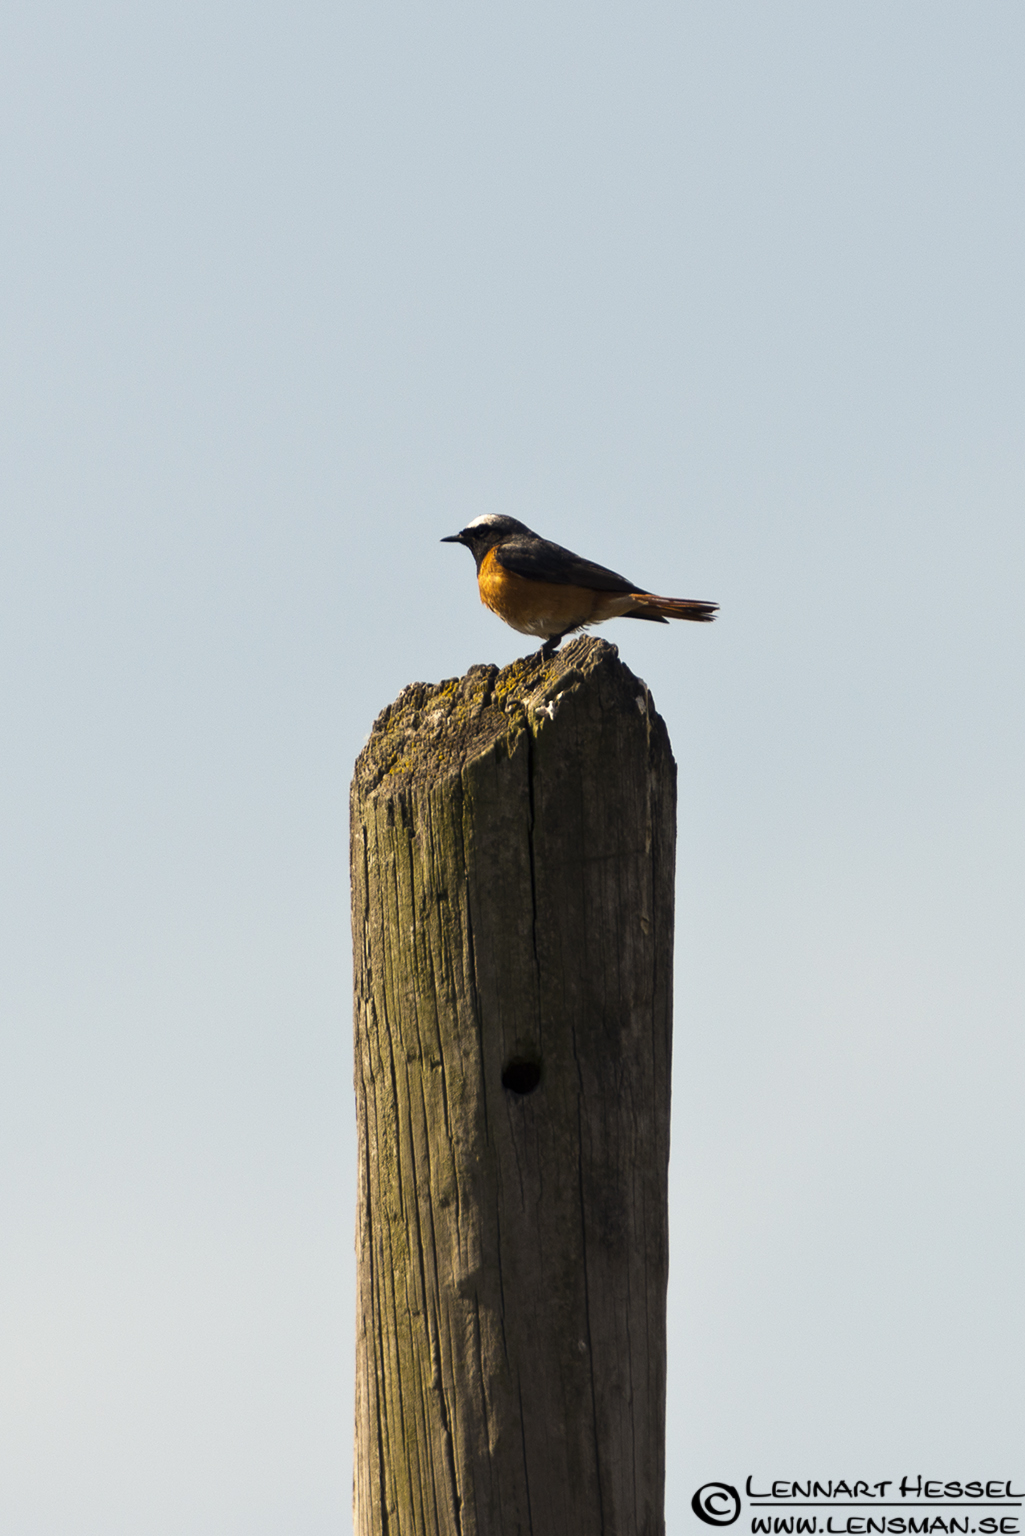 Common Redstart in Piedmont, Italy